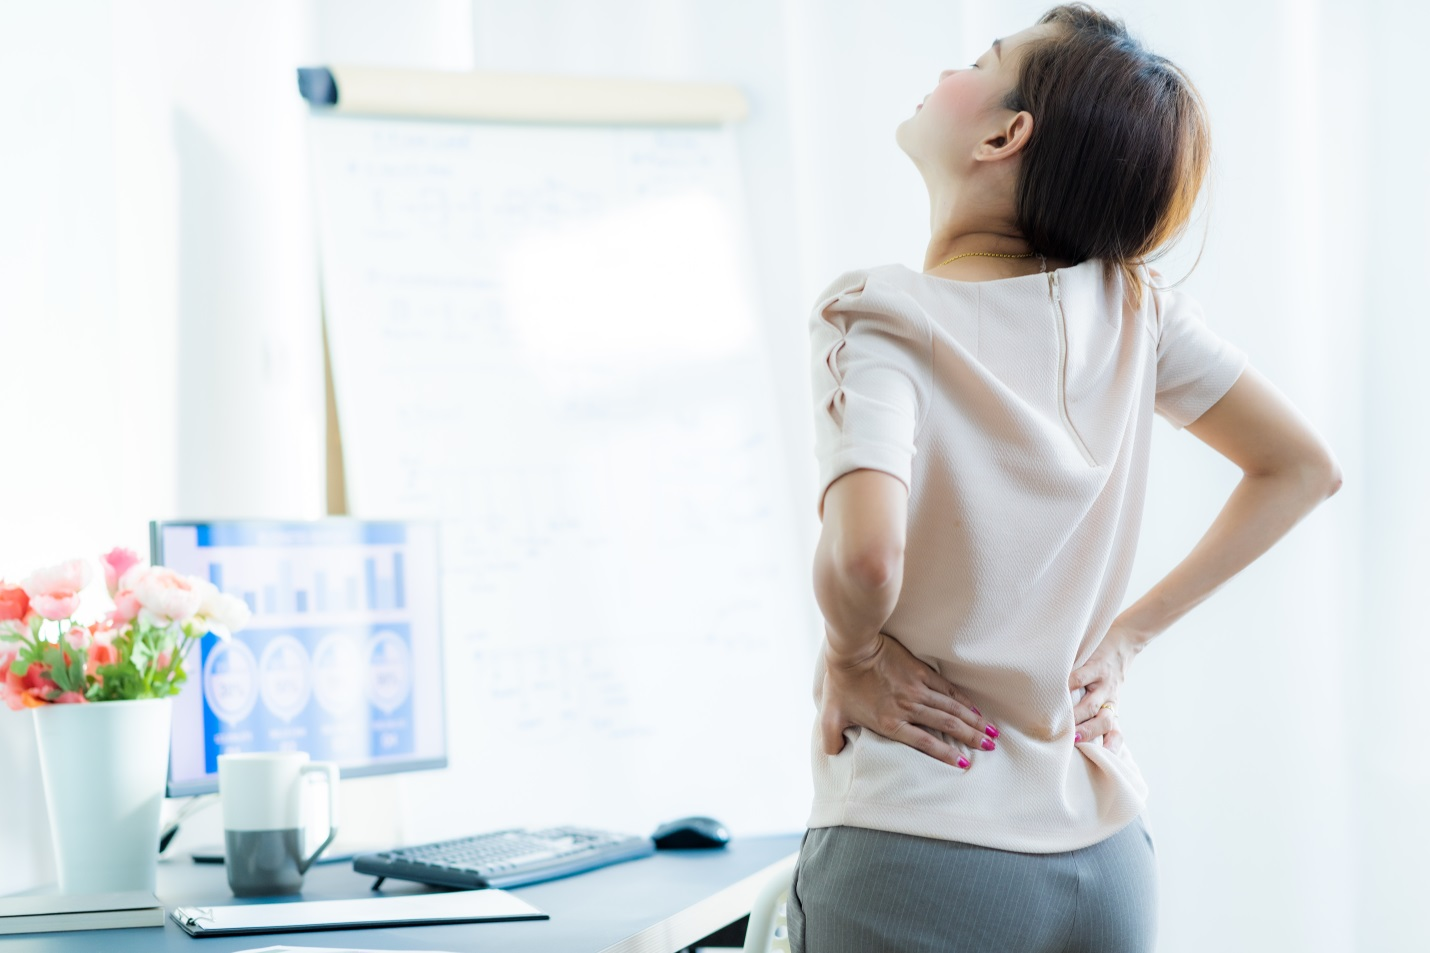 5 Hal yang Bisa Bantu Kurangi Sakit Punggung Selama WFH